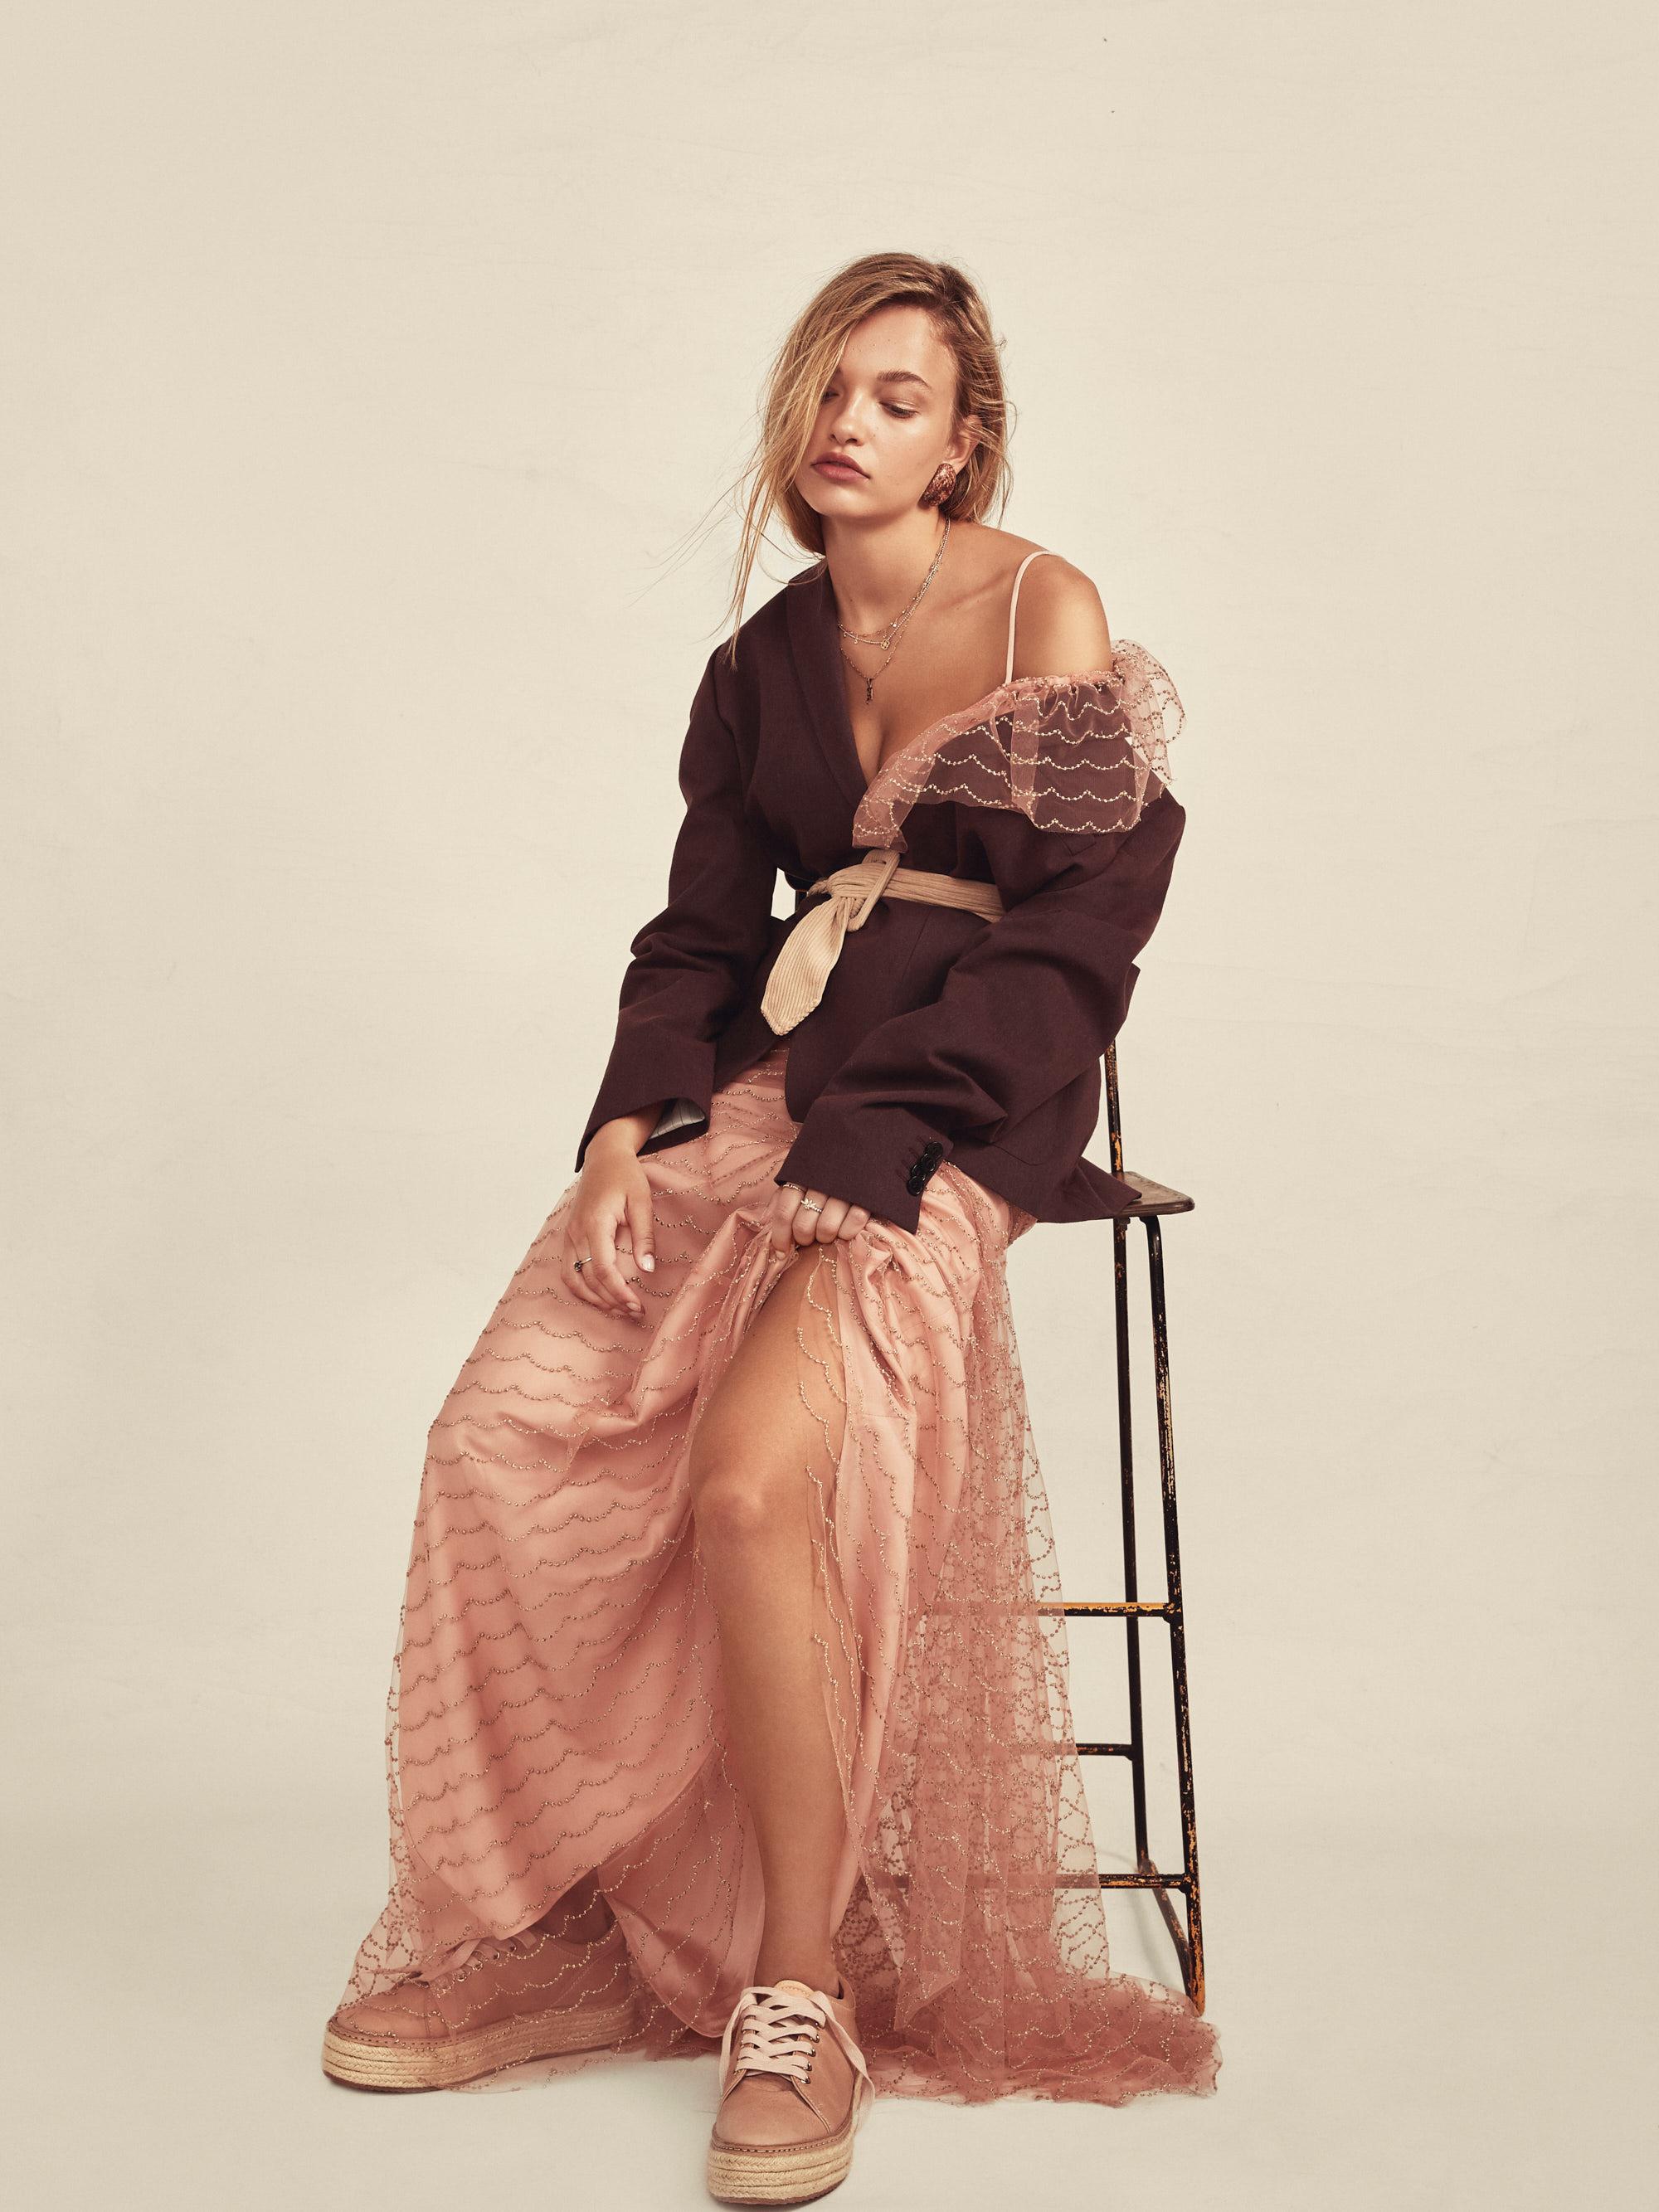 Marcs clothing fashion editorial by Simon Everiss.jpg